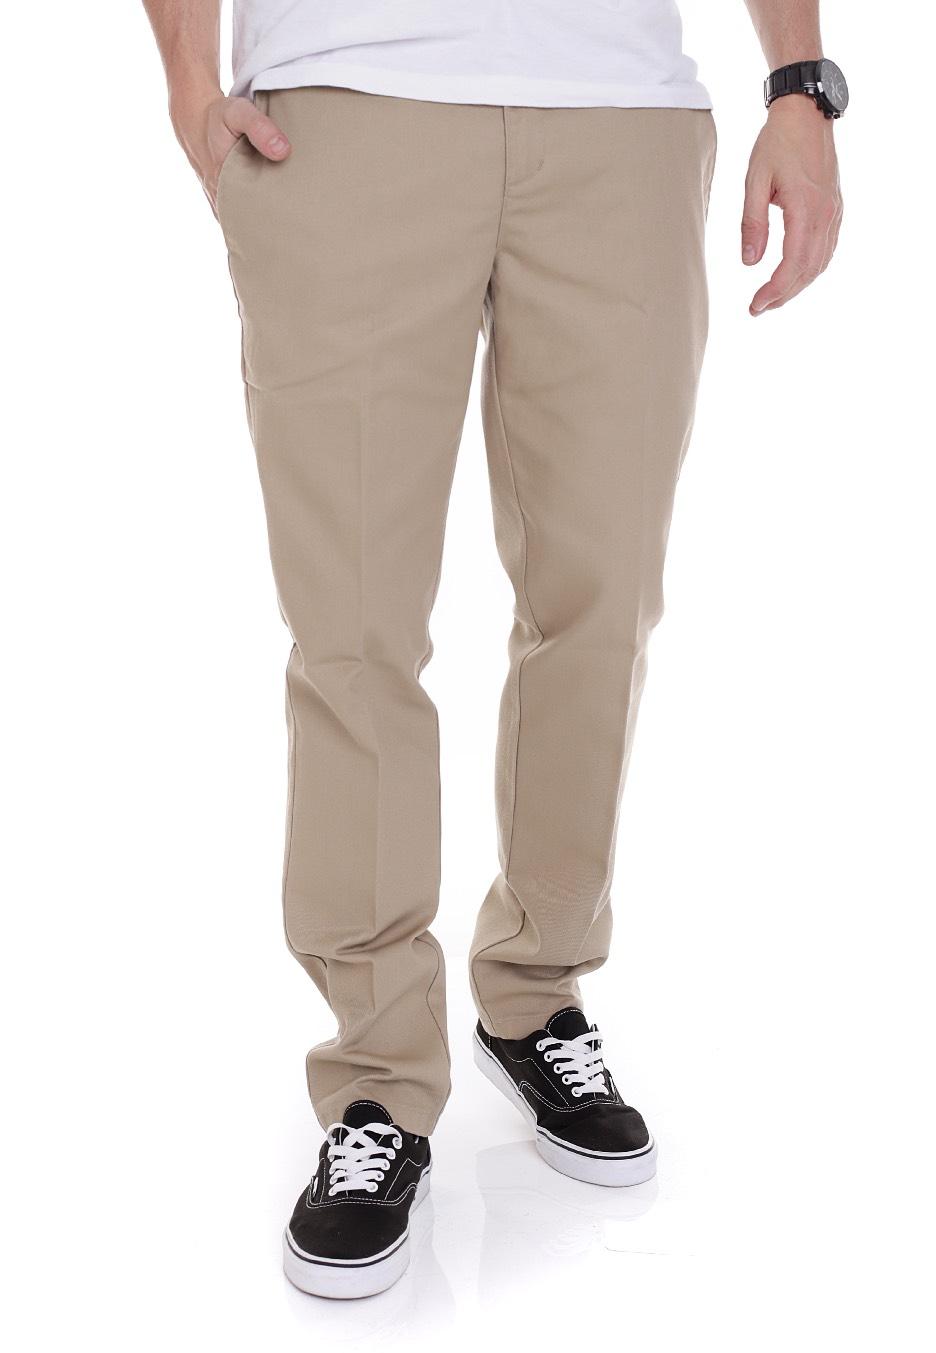 Cool Khaki  Dickies Women39s Premium Pleated Front Pants  FP220KH